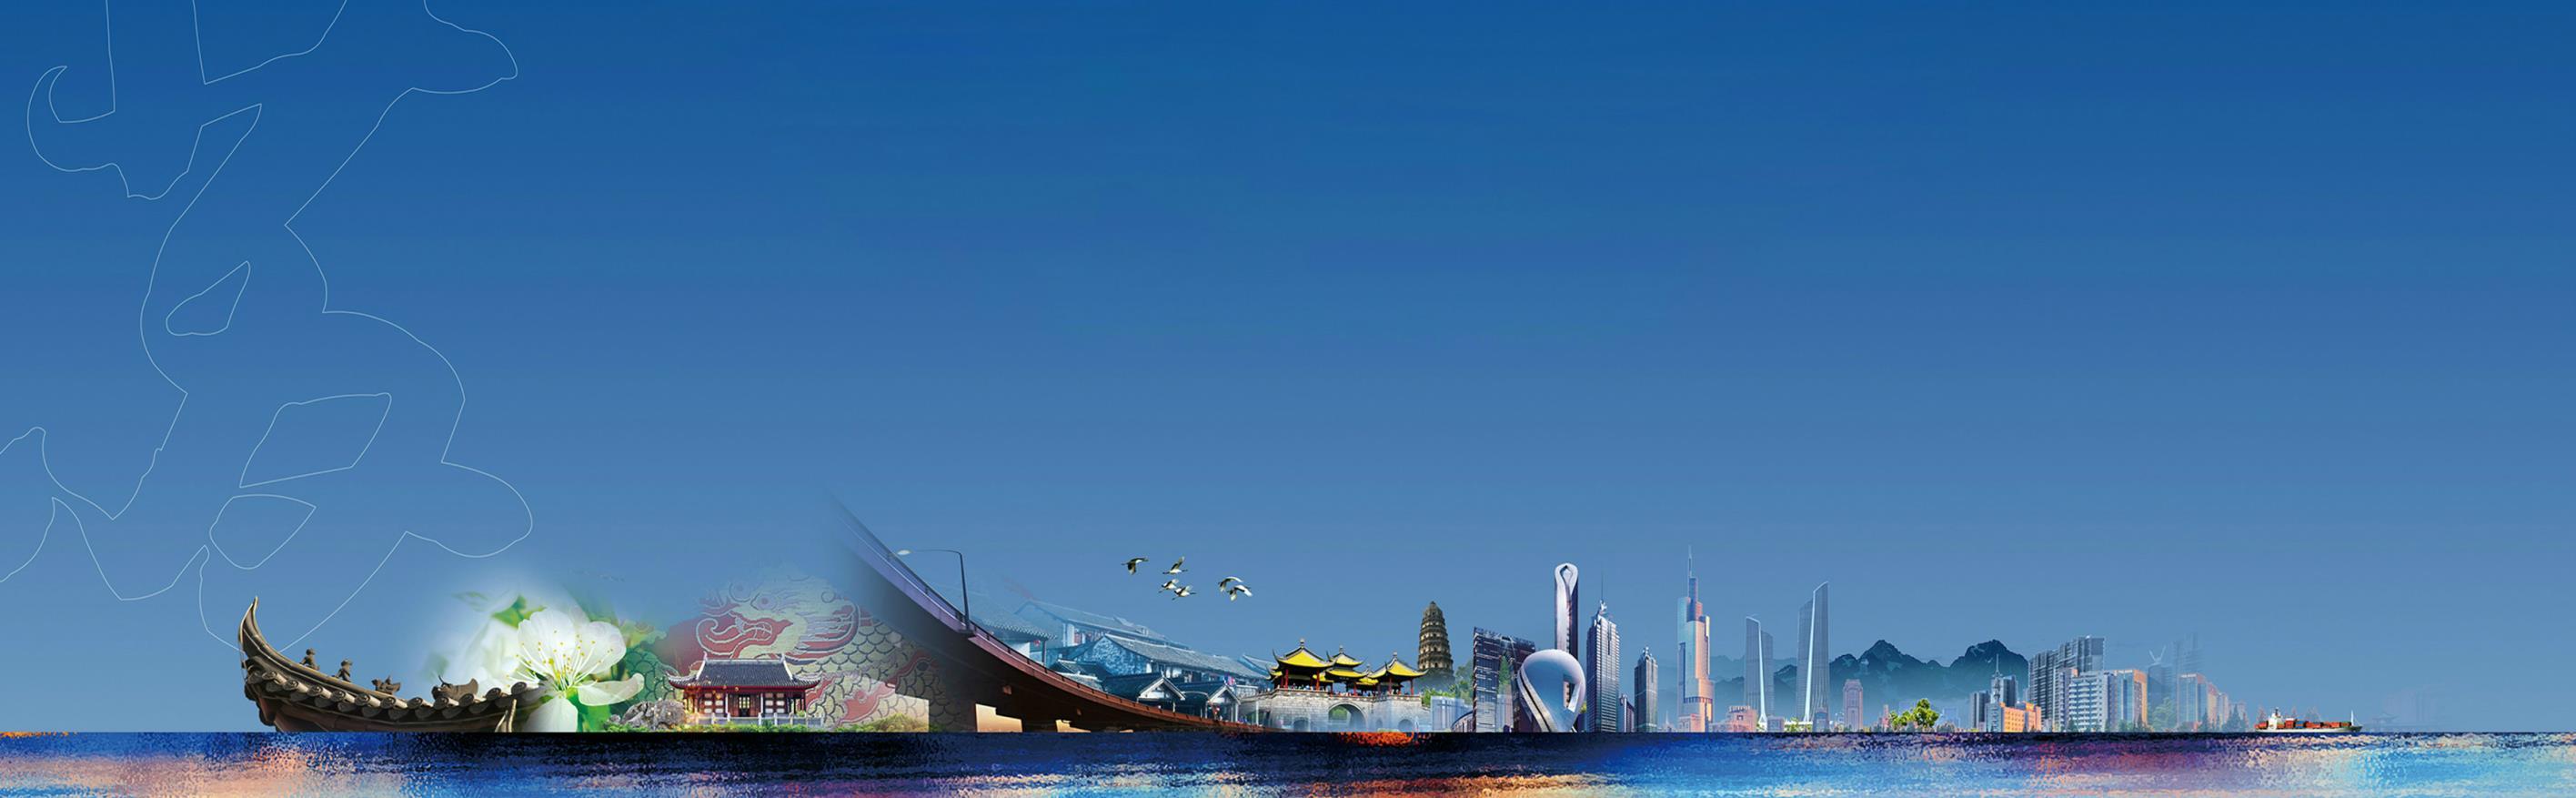 2020 Jiangsu Export Online Fair <br \>(Two Wheel Station)